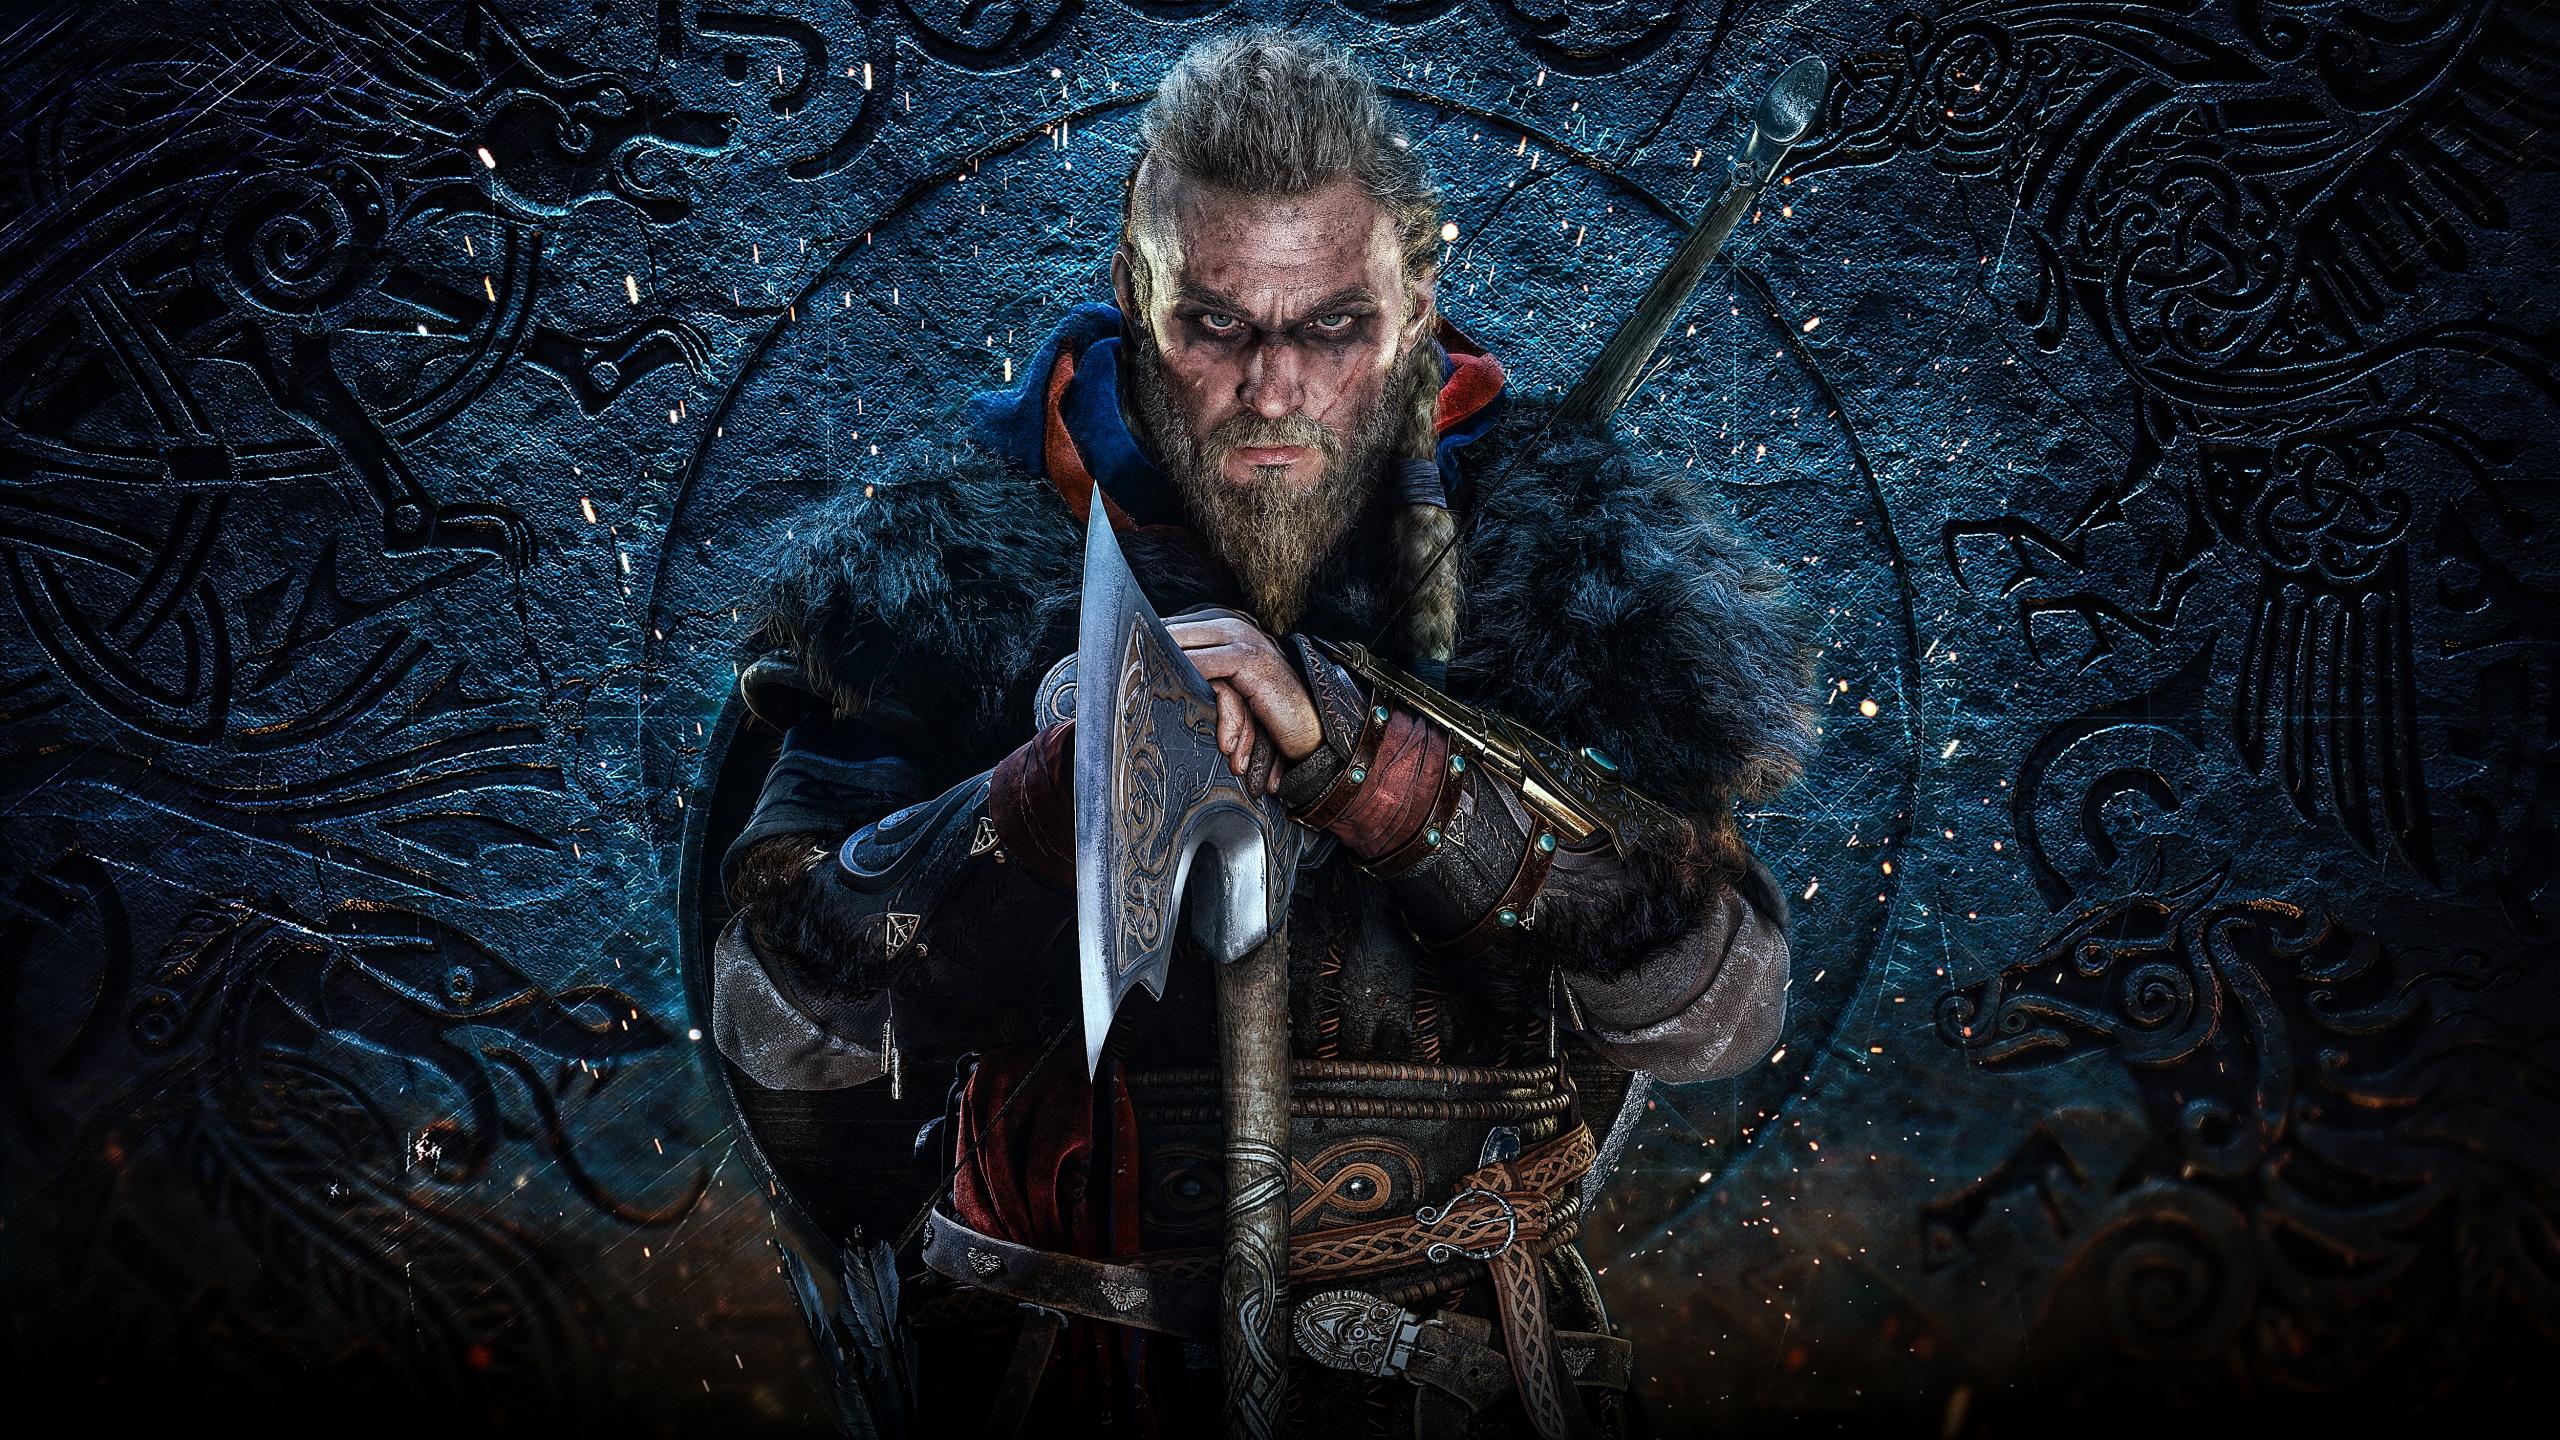 Eivor 4k Wallpaper Assassin S Creed Valhalla Viking Raider Pc Games Playstation 4 Games 1033